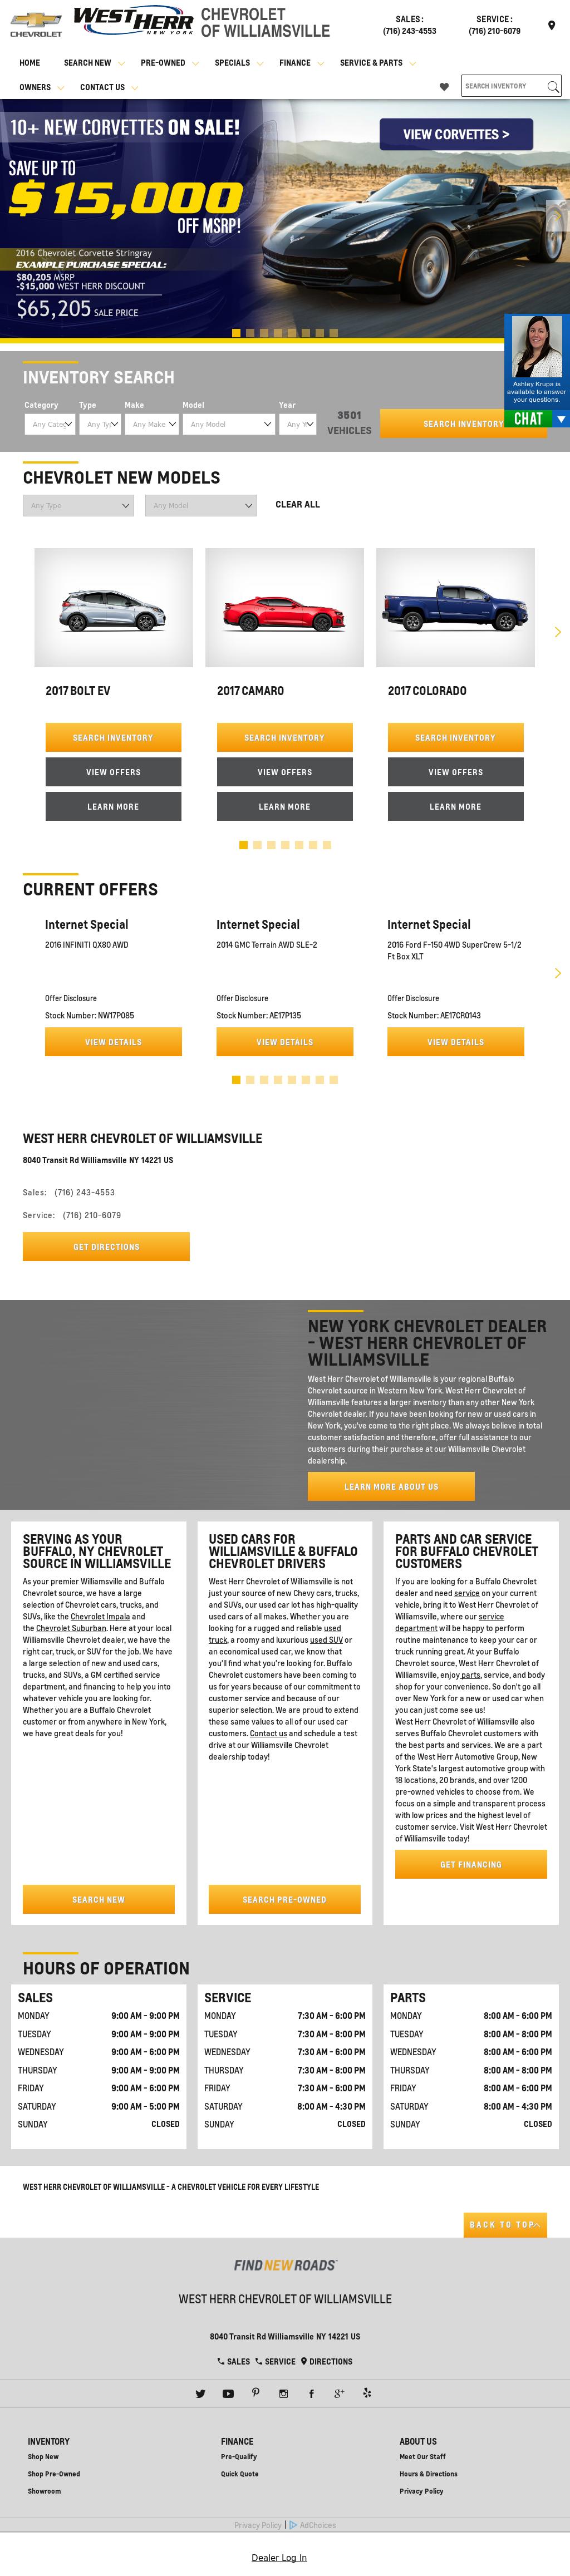 West Herr Chevrolet Of Williamsville Website History